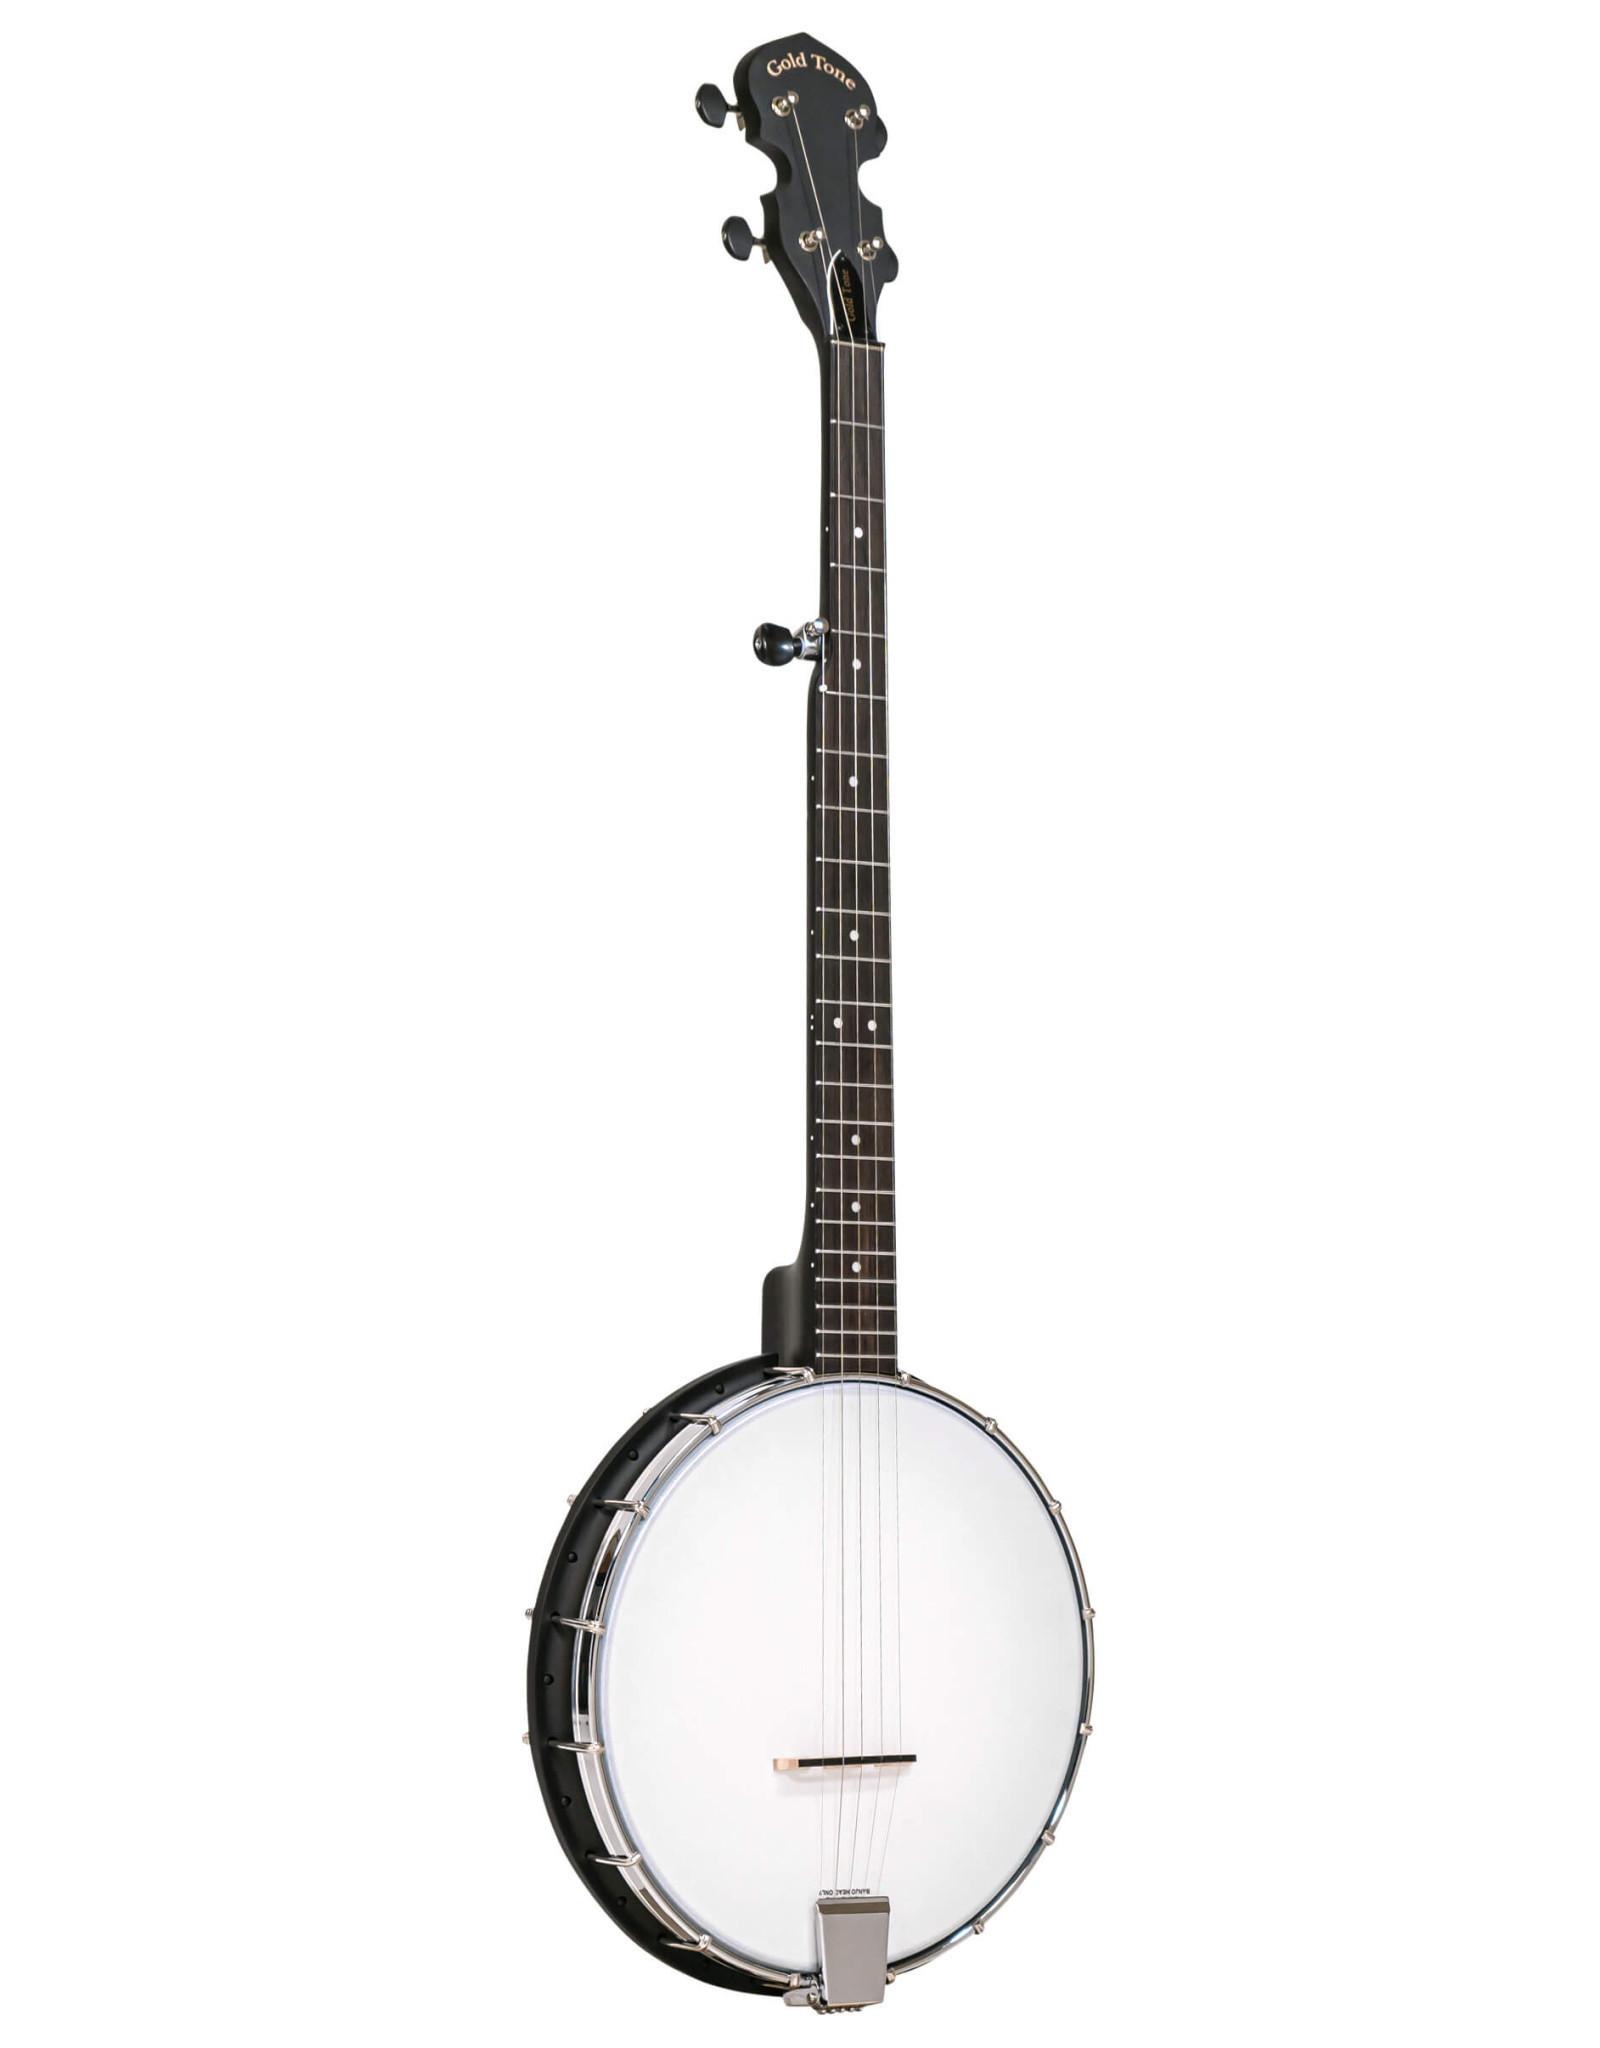 Gold Tone Gold Tone AC-1: Acoustic Composite 5-String Open back Banjo w/Gig Bag